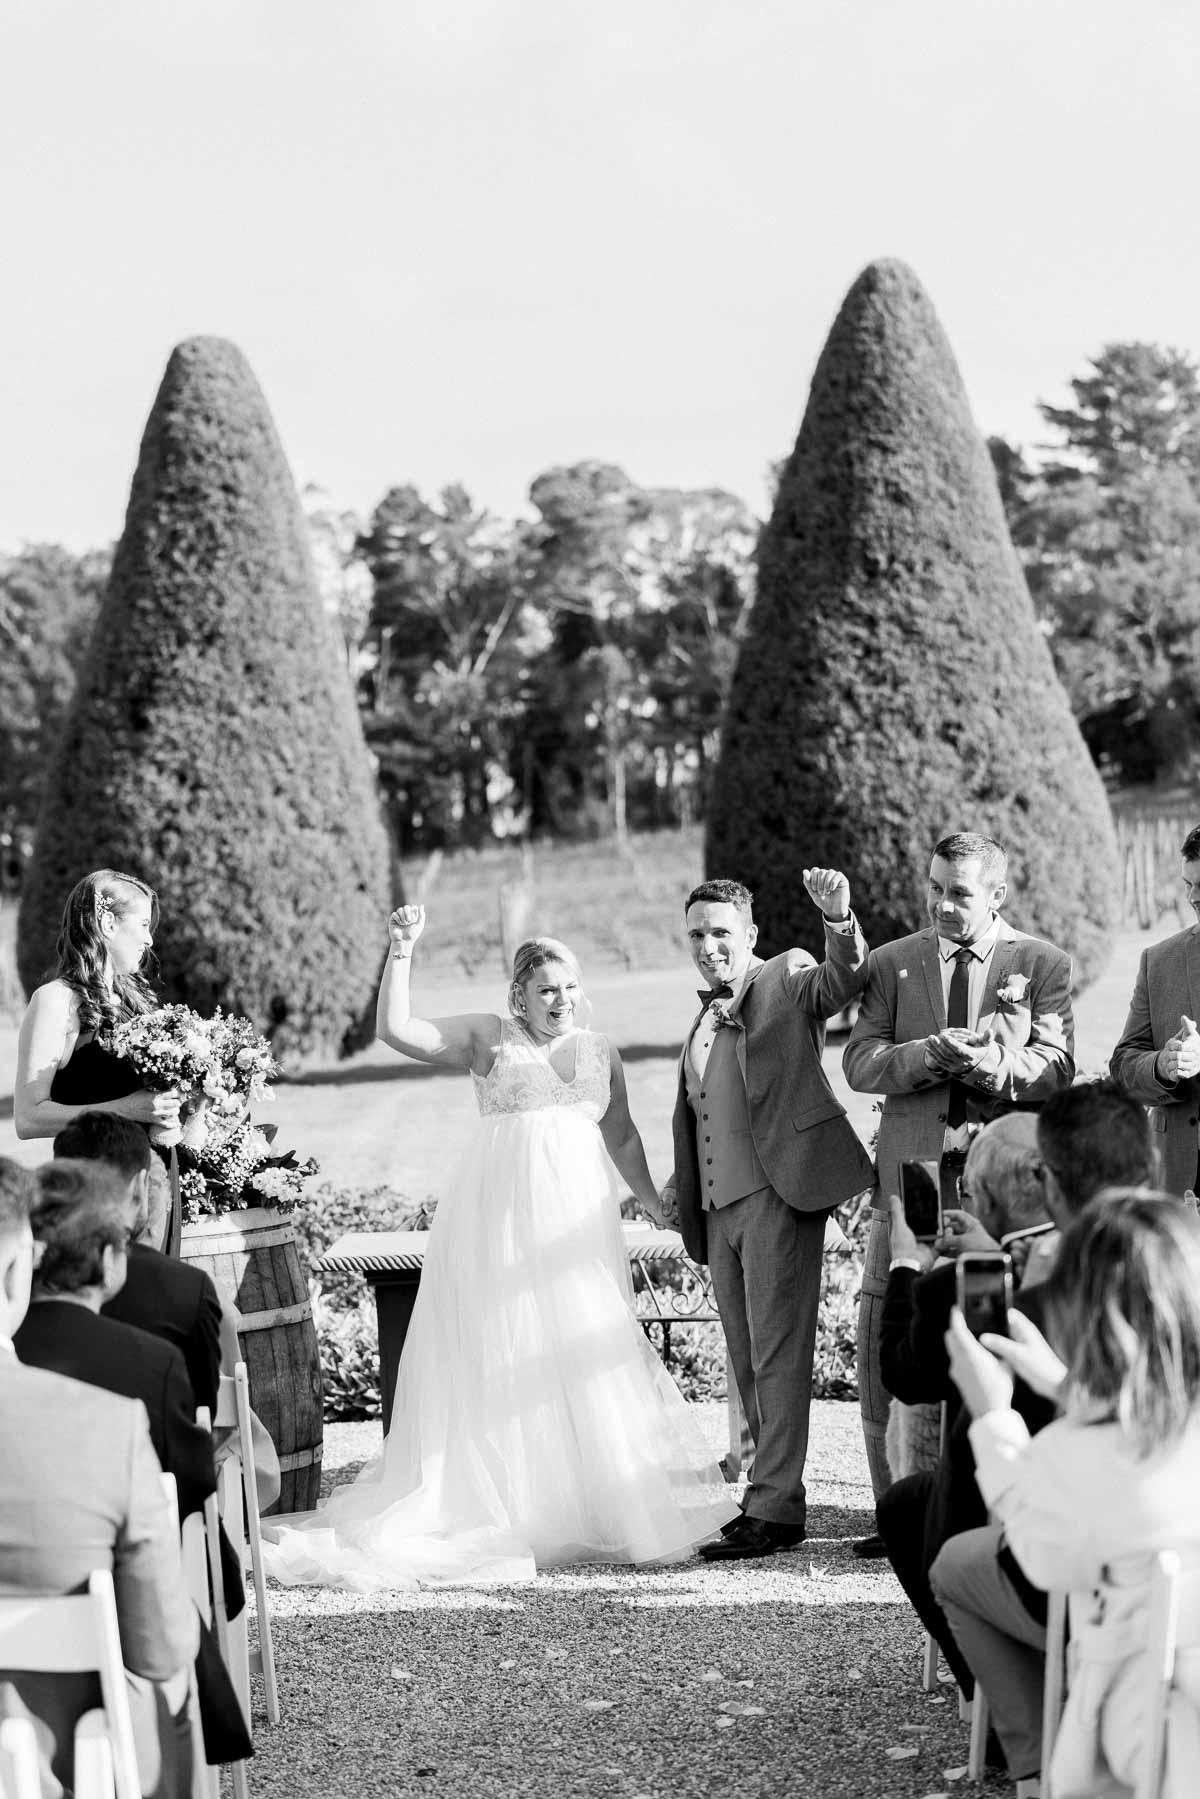 lindenderry-wedding-heart+soul-weddings-amy-alain-03369.jpg